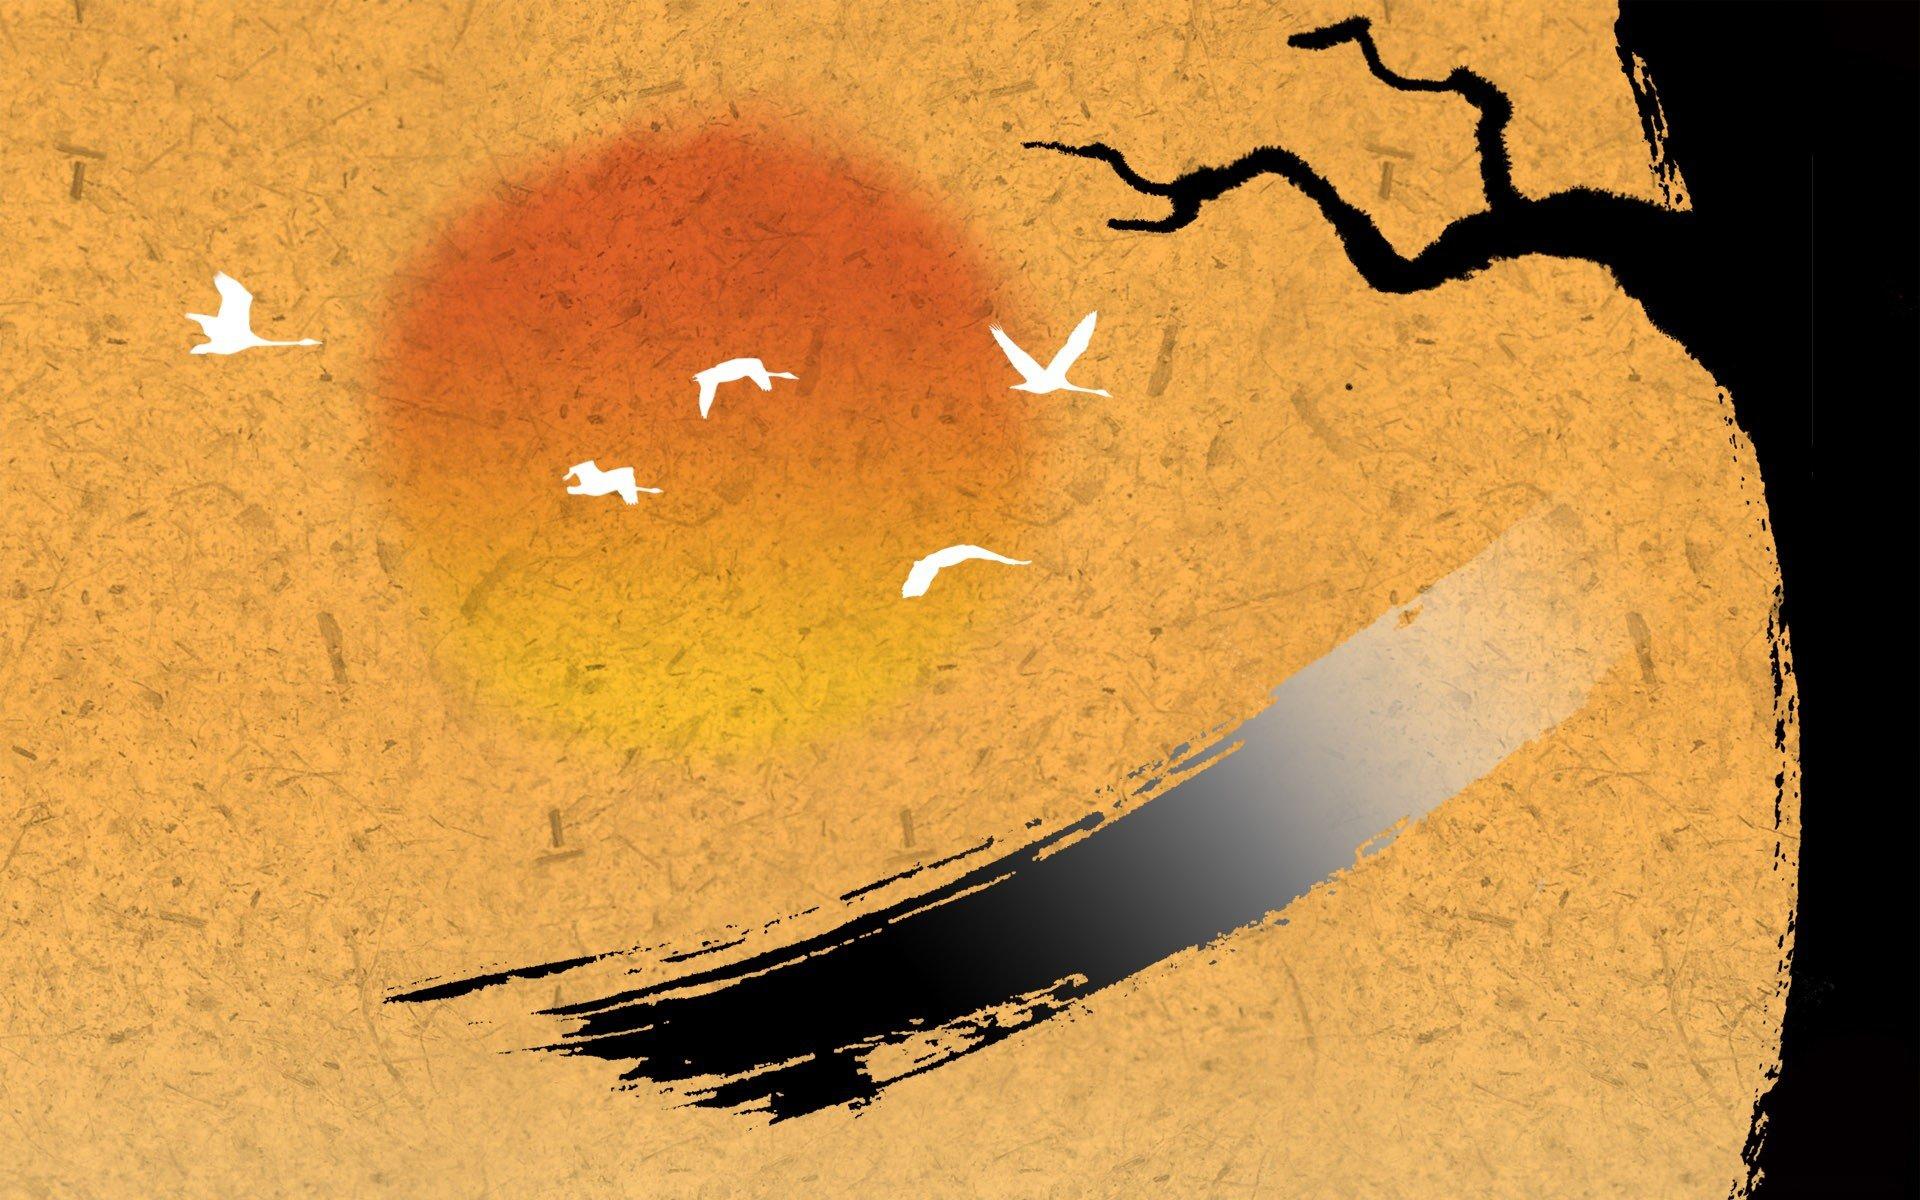 Free 3d Fall Wallpaper Hd Chinese Background Designs Pixelstalk Net